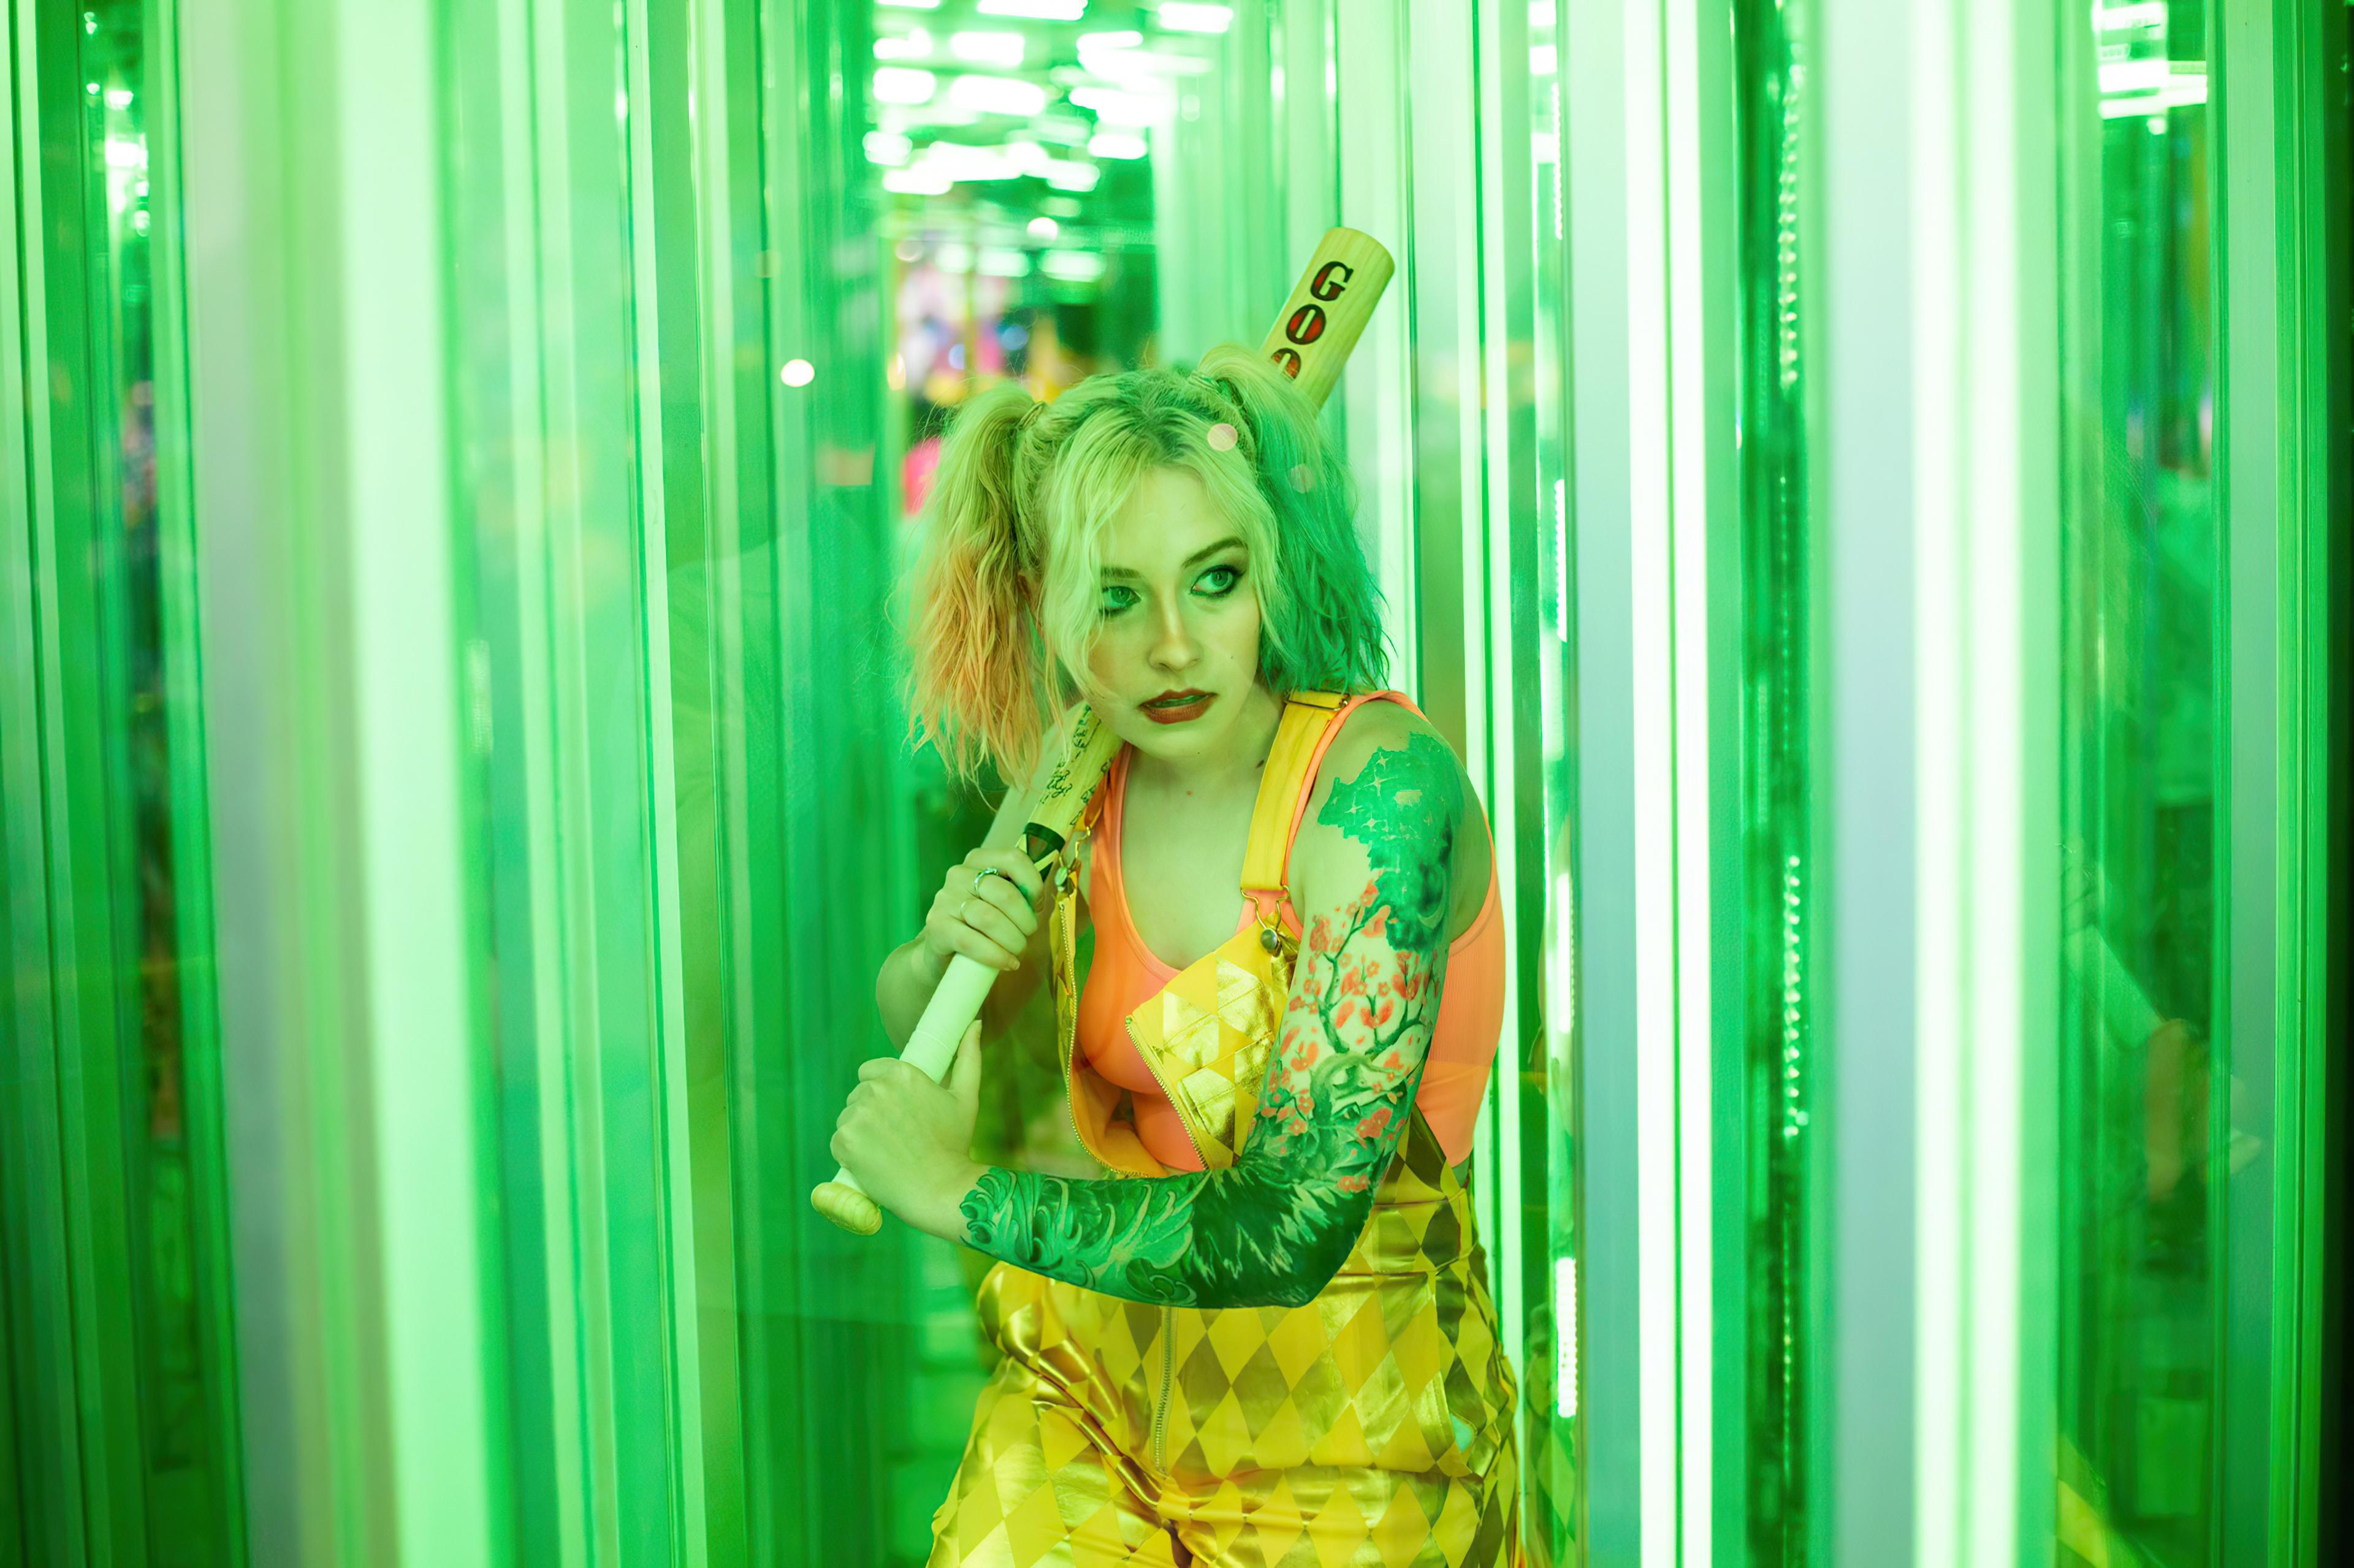 Fondos de pantalla Harley Quinn Cosplay Girl